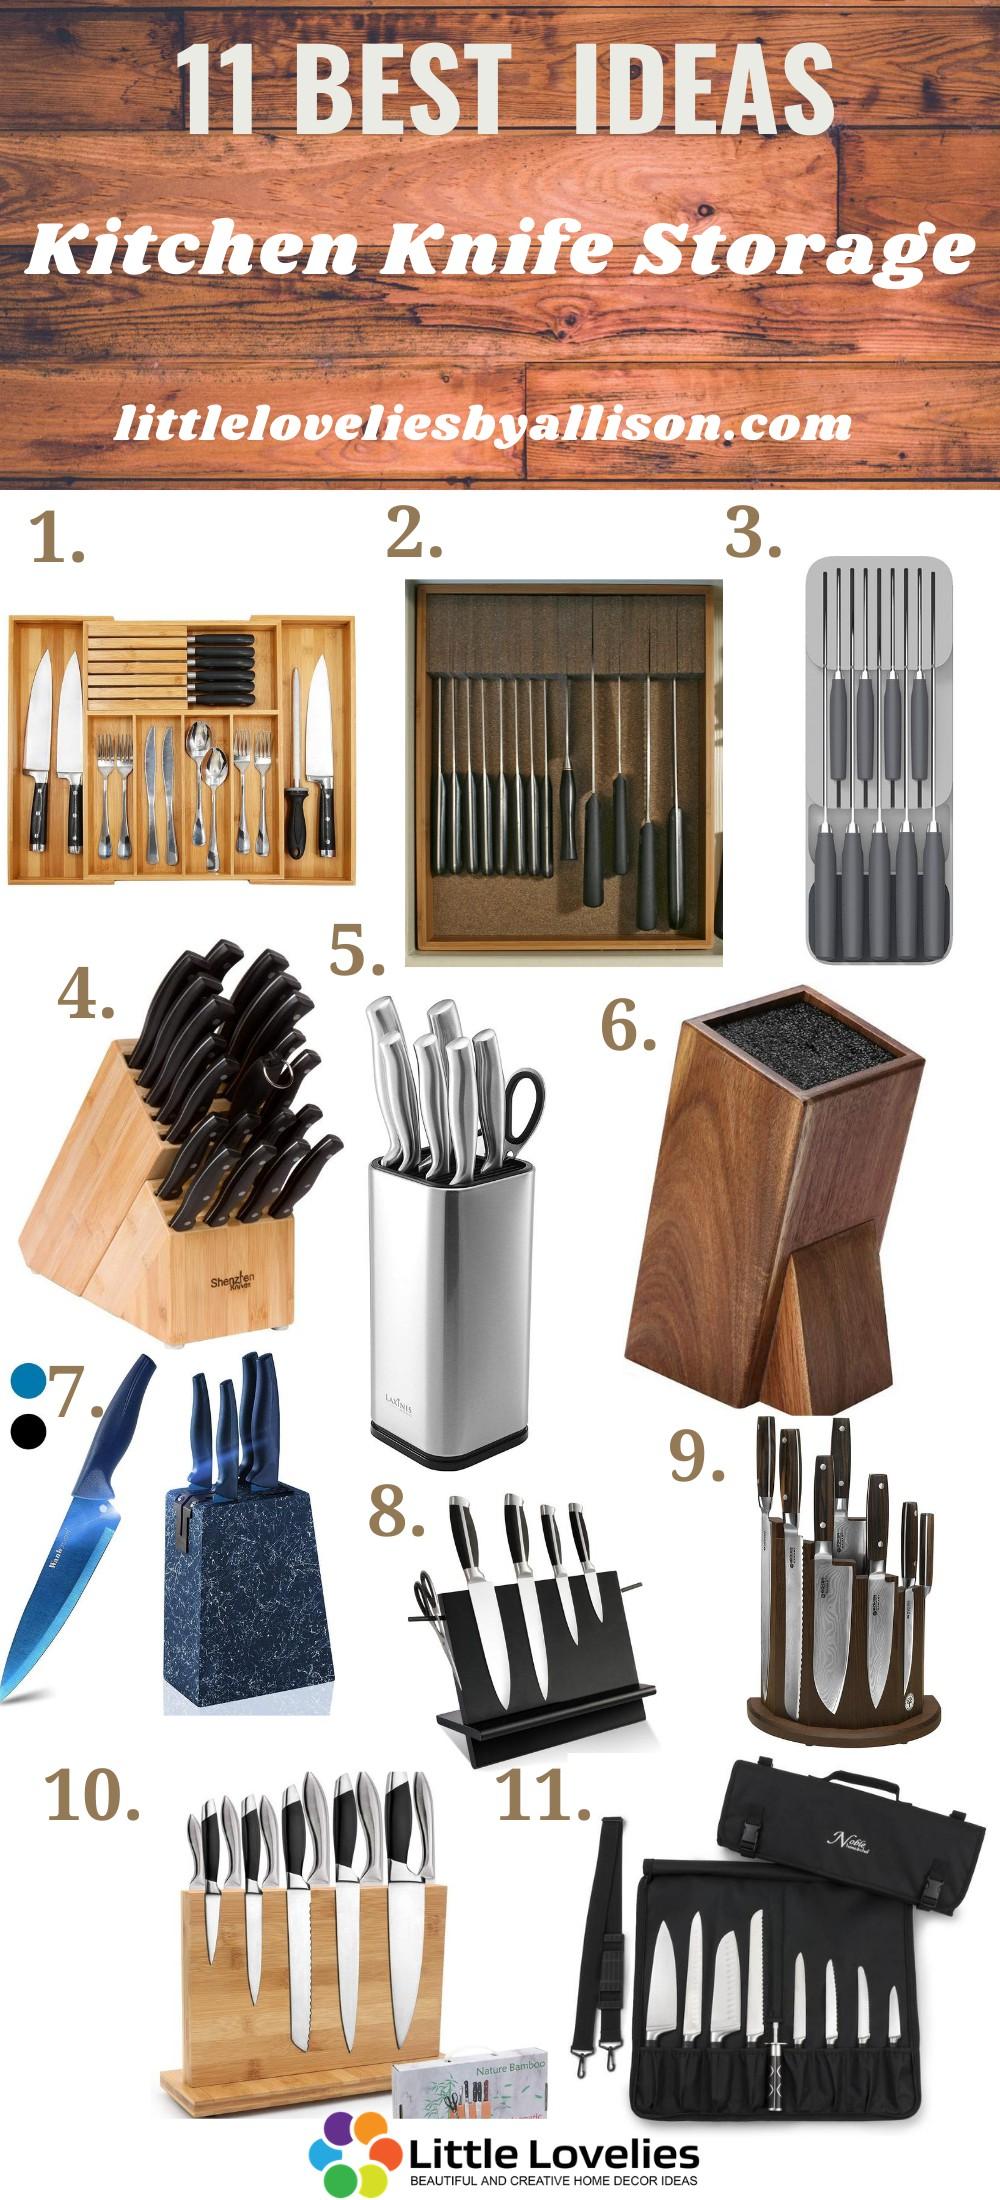 Favorite Knife Storage Tray